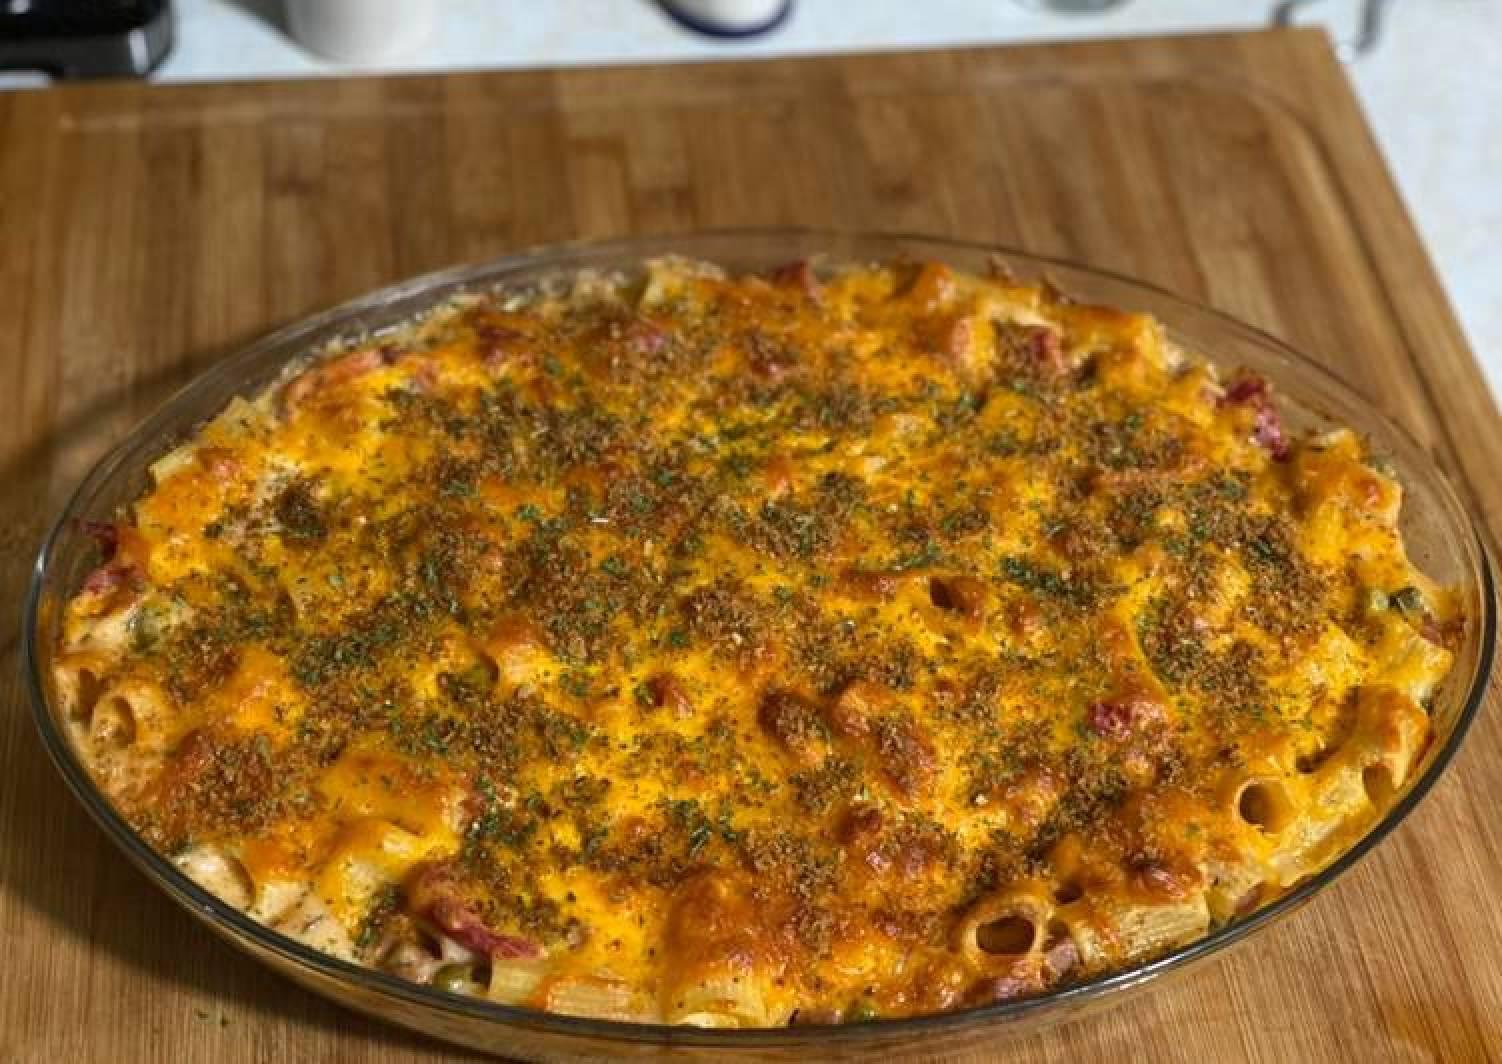 Baked Macaroni & Cheese (Surf & Turf)